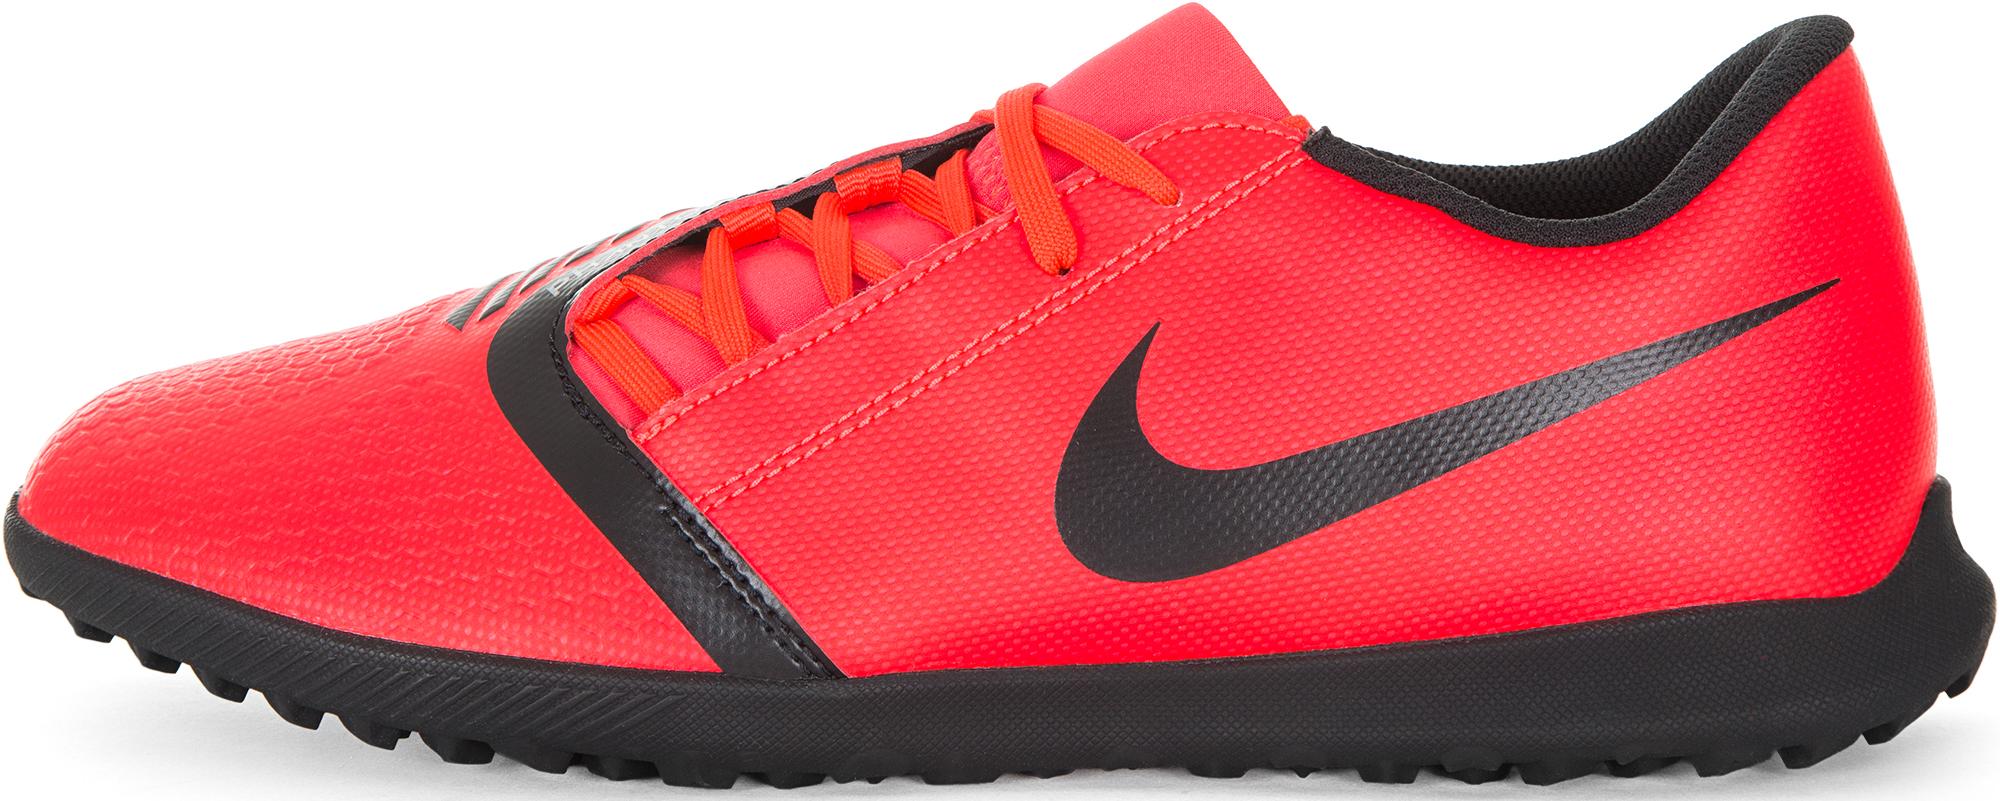 Nike Бутсы мужские Nike Phantom Venom Club TF, размер 45